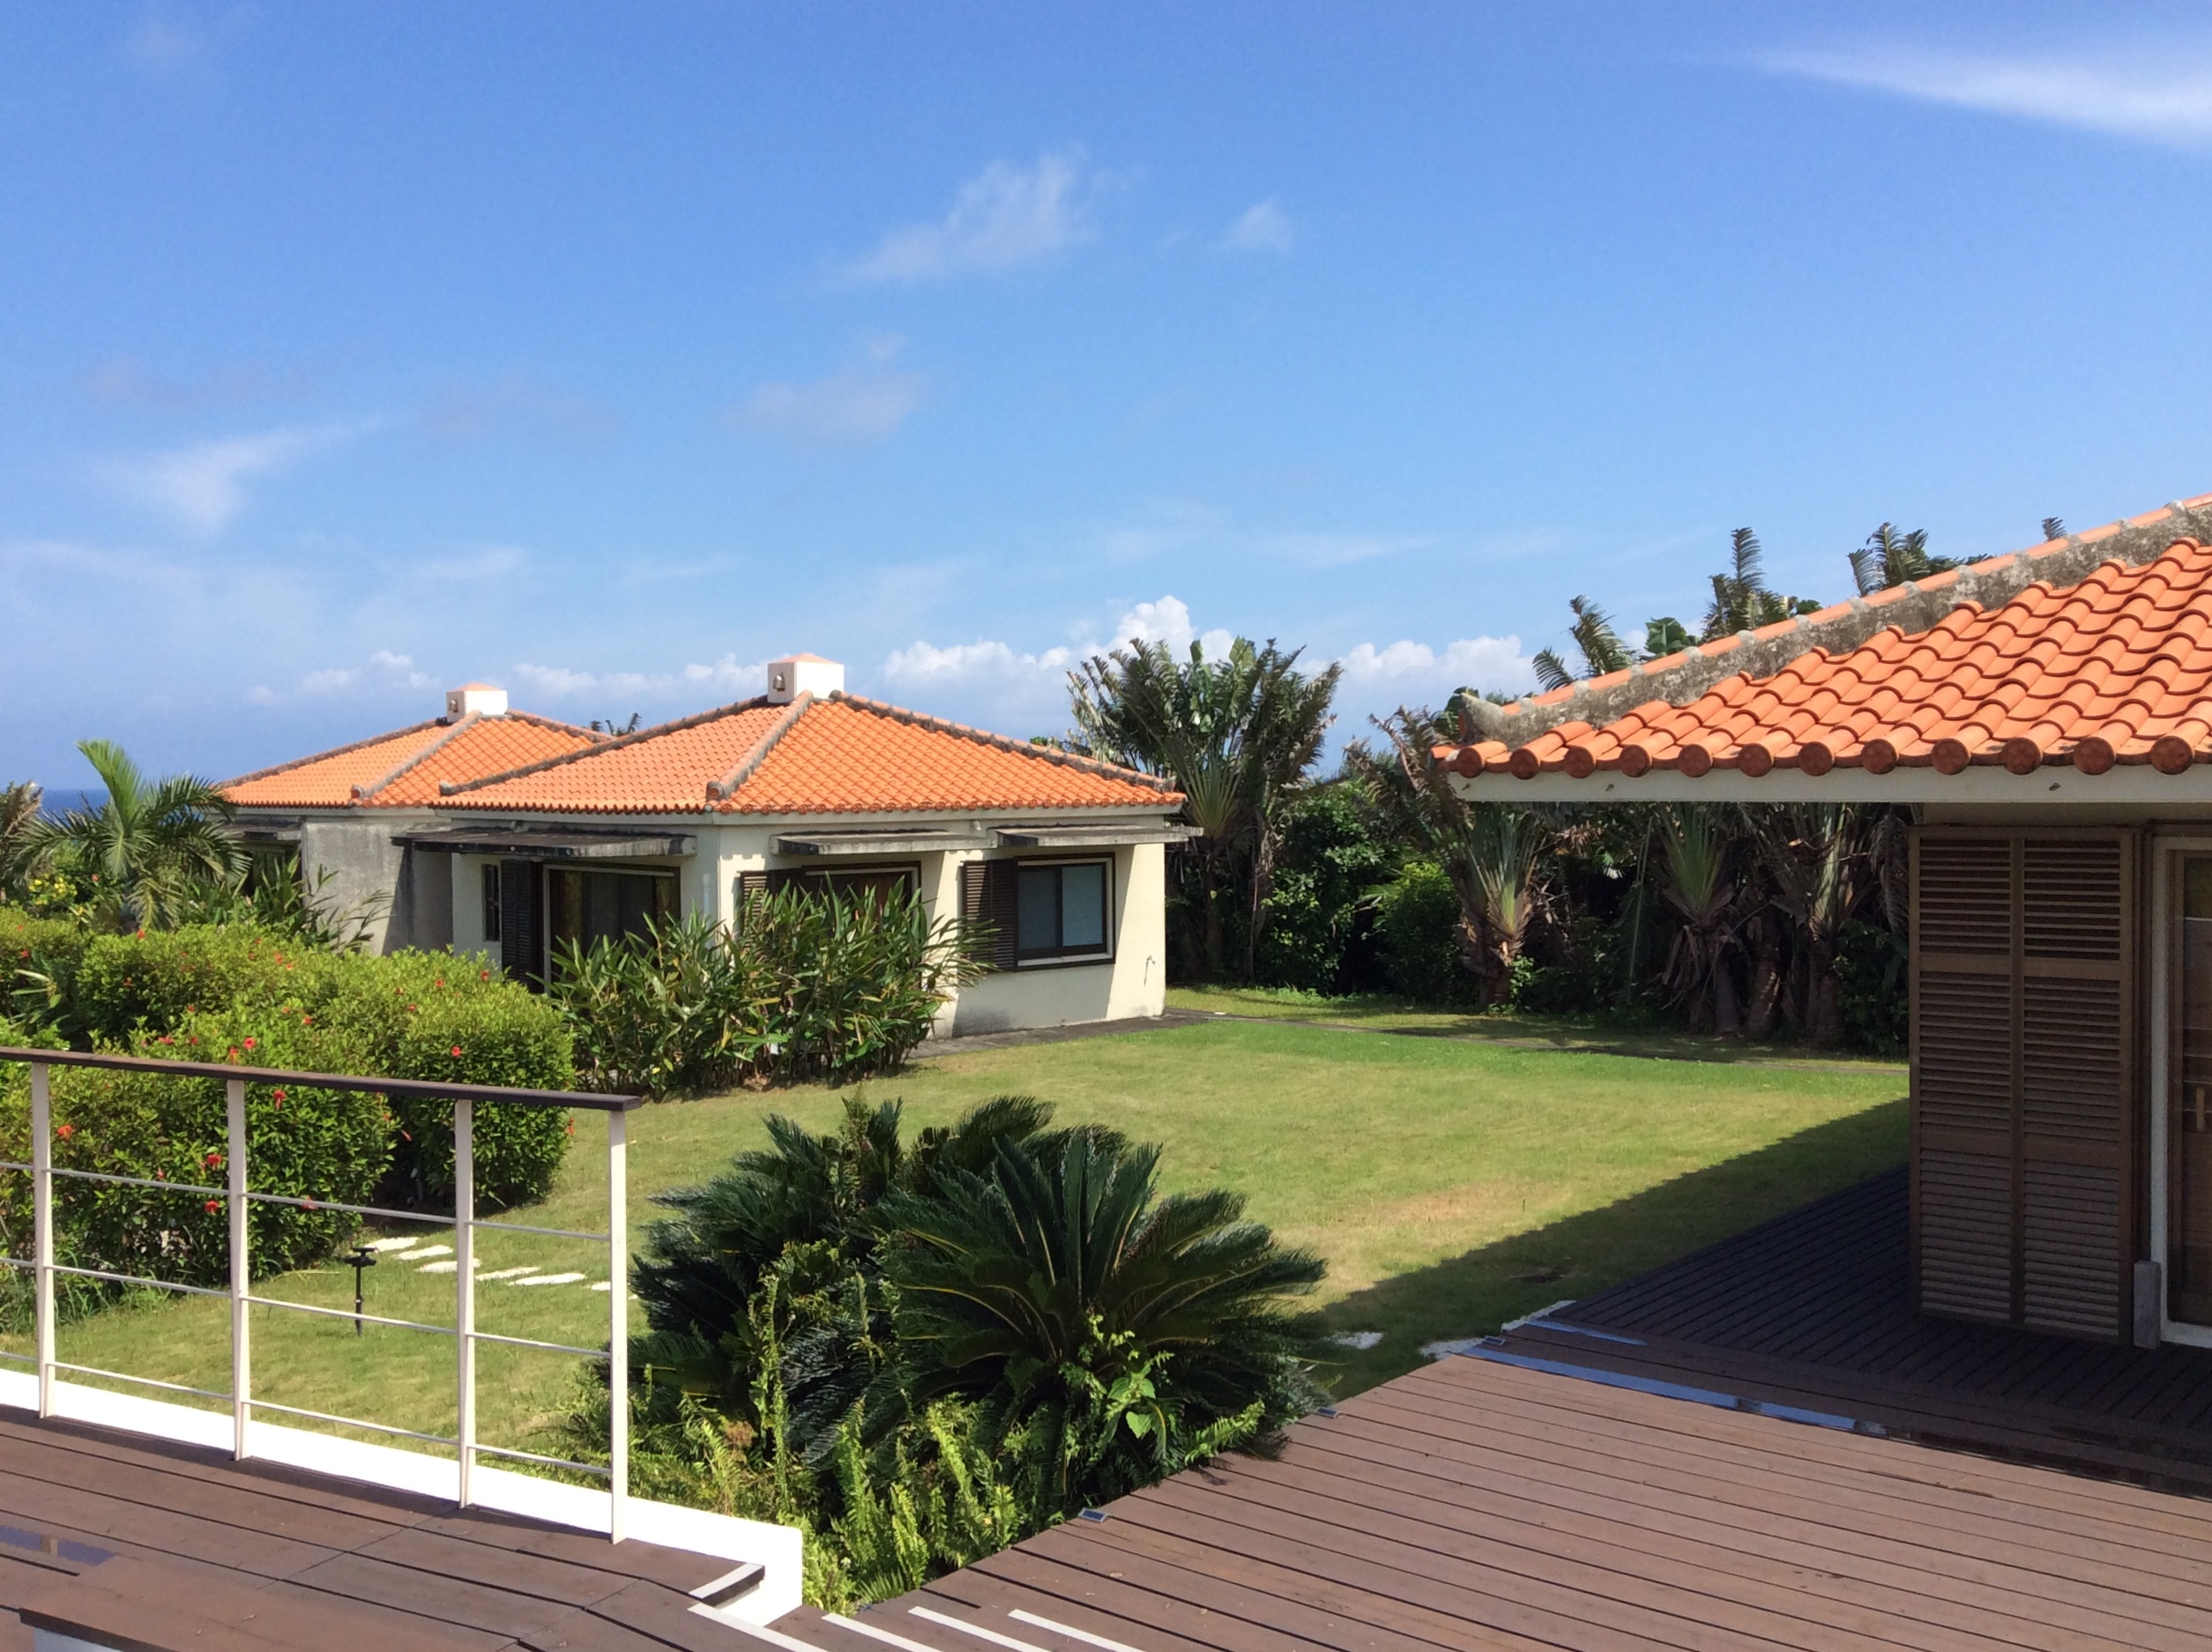 Villa芭蕉<西表島>の施設画像